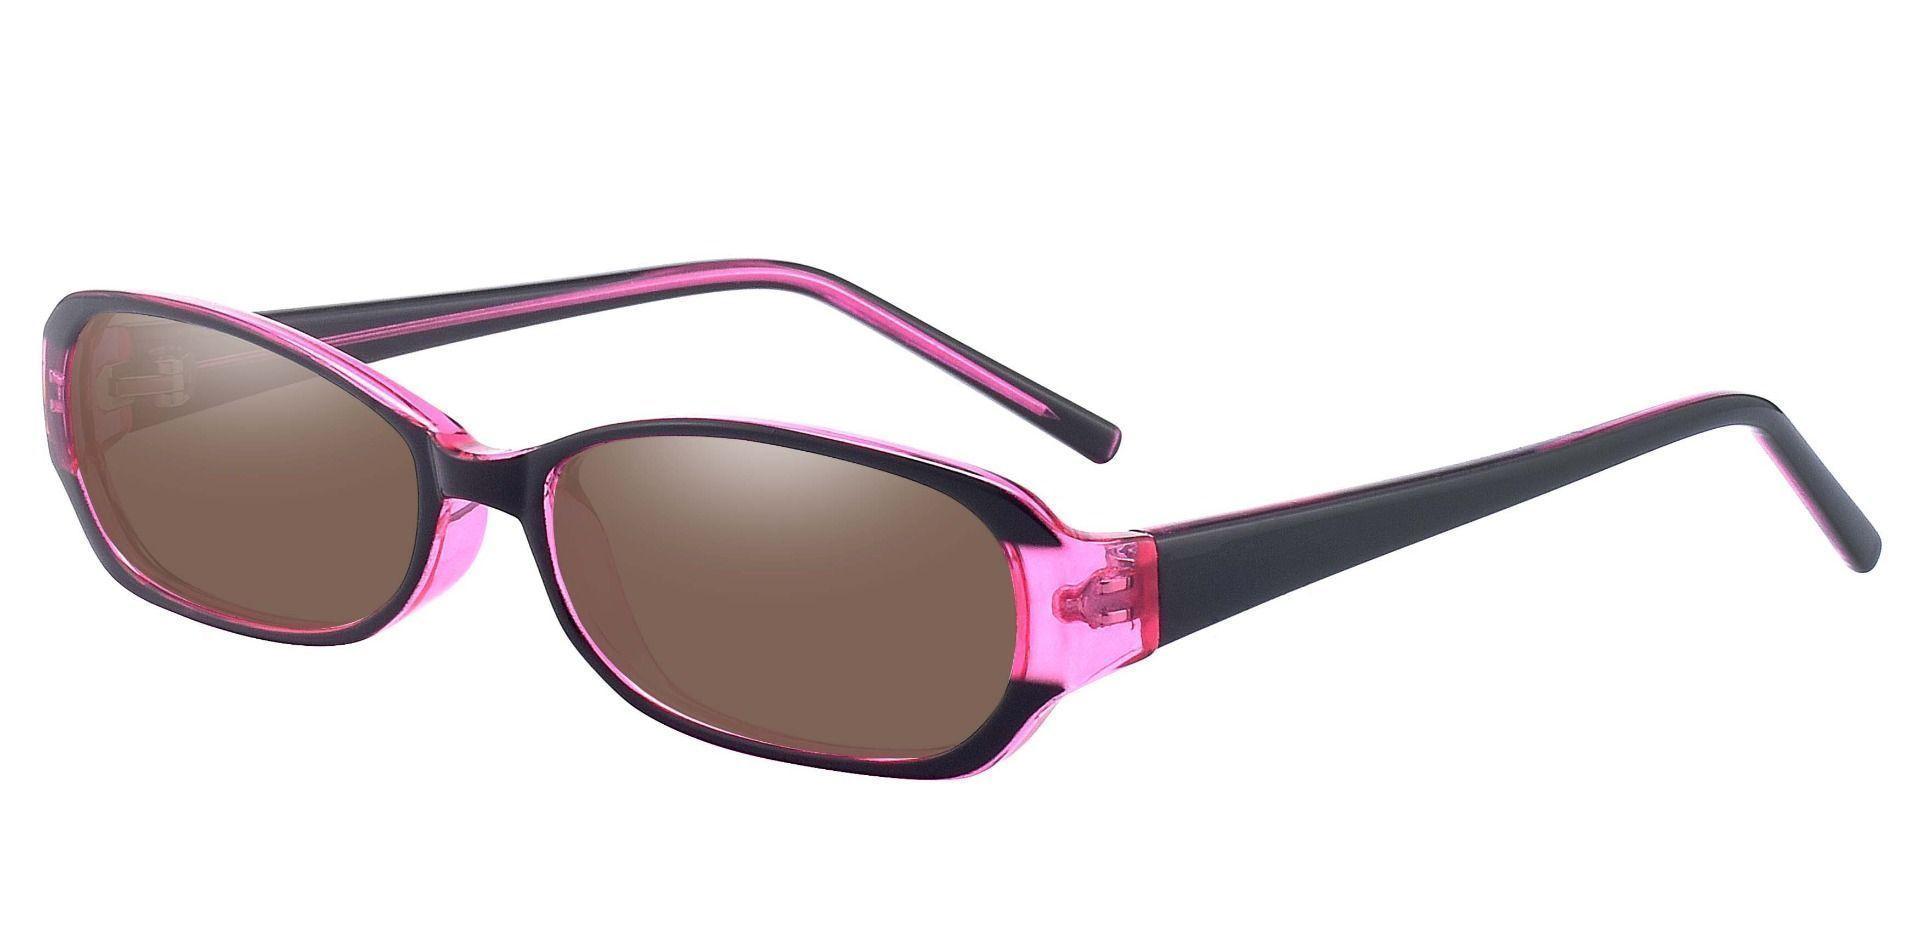 Nairobi Oval Single Vision Sunglasses -  Purple Frame With Brown Lenses